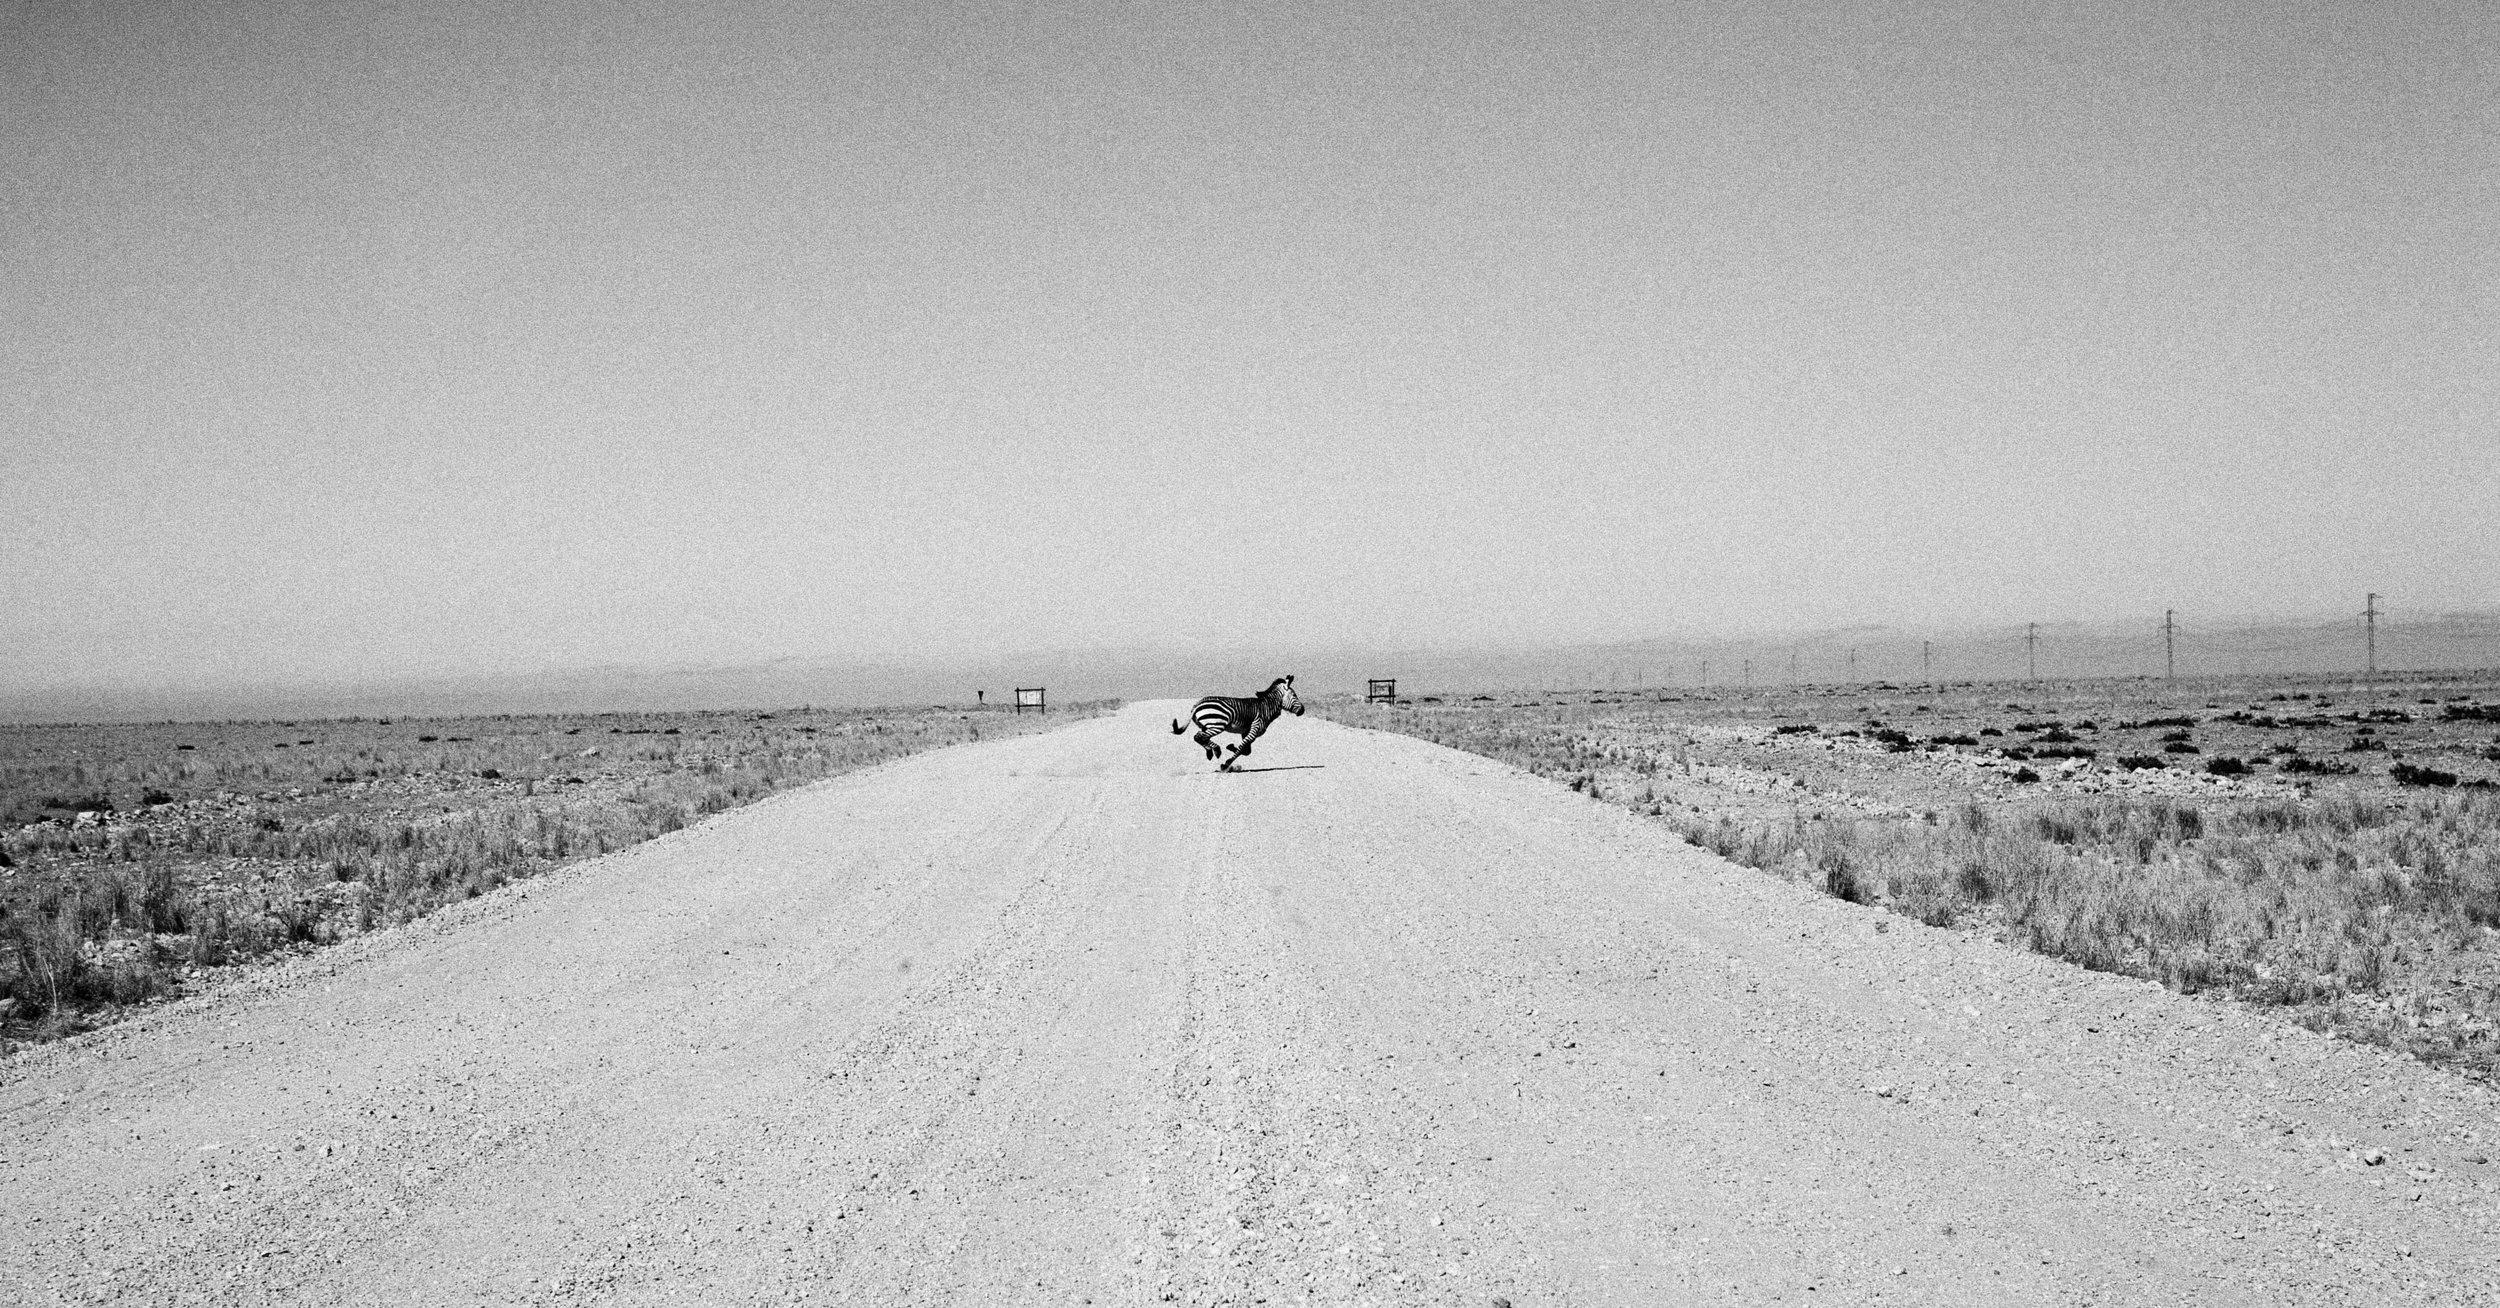 _MG_4812-zebra-running-bw2-crop-ig.jpg